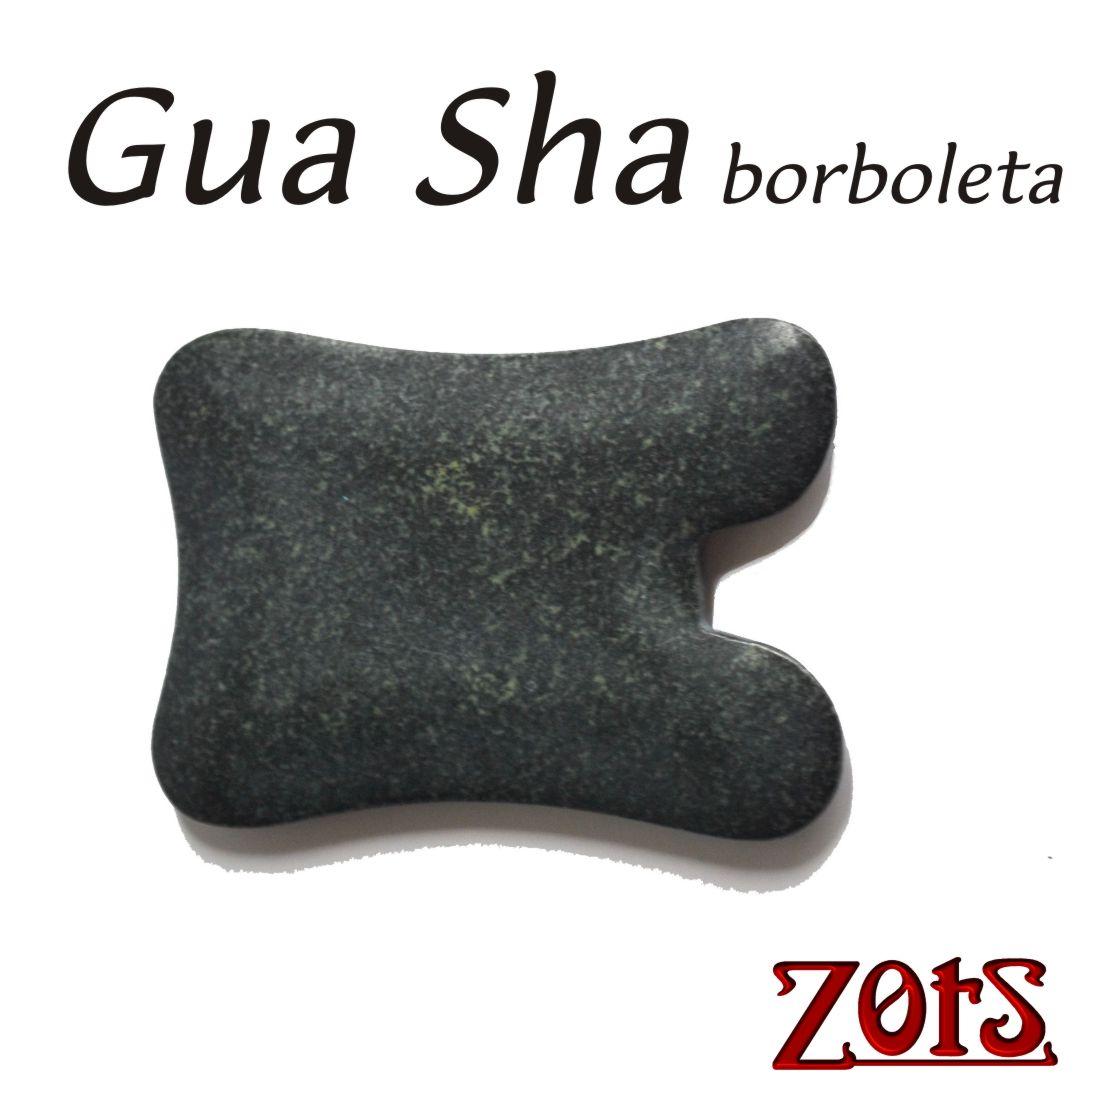 GuaShá borboleta